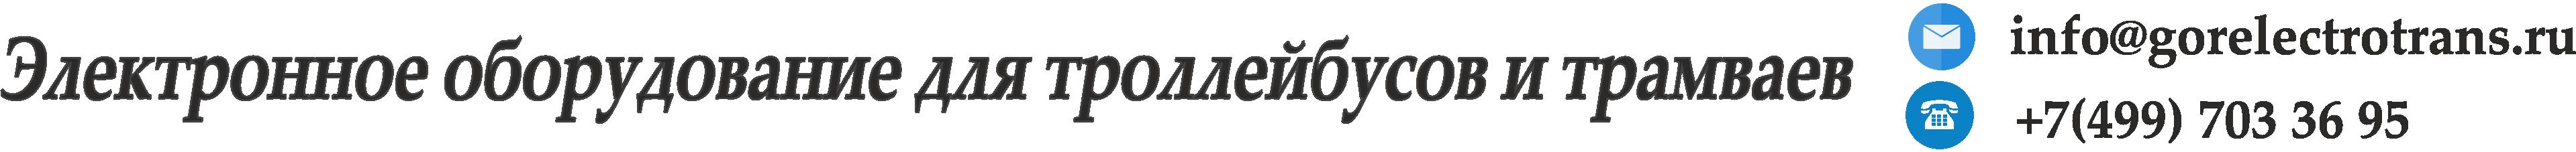 ГорЭлектроТранс